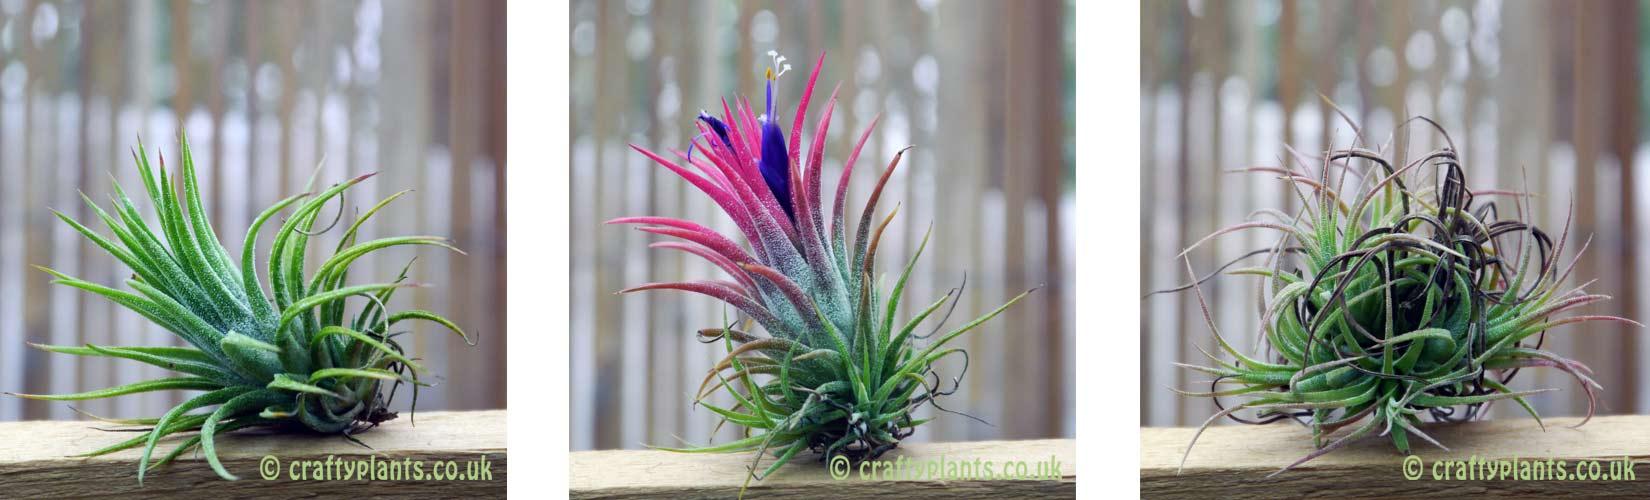 Цветок тилландсия анита: уход в домашних условиях